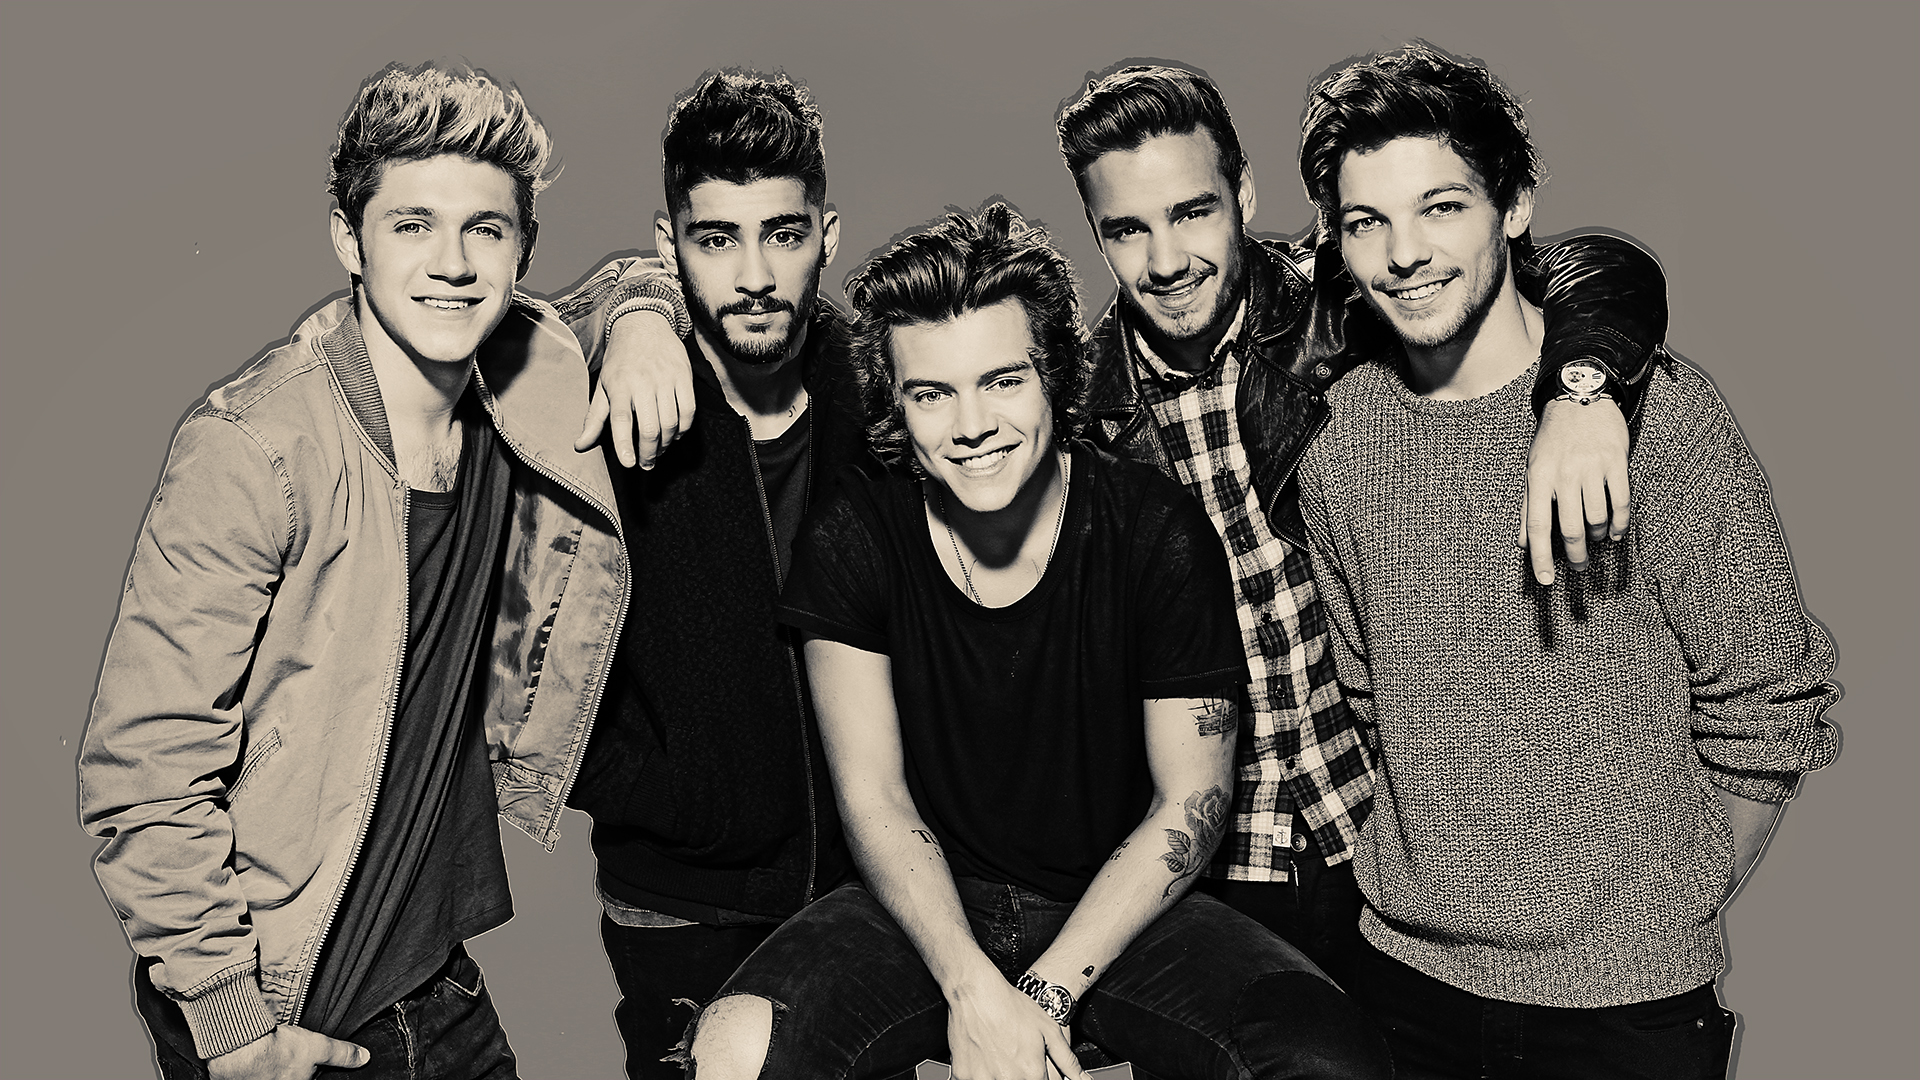 One Direction Wallpaper Hd - HD Wallpaper